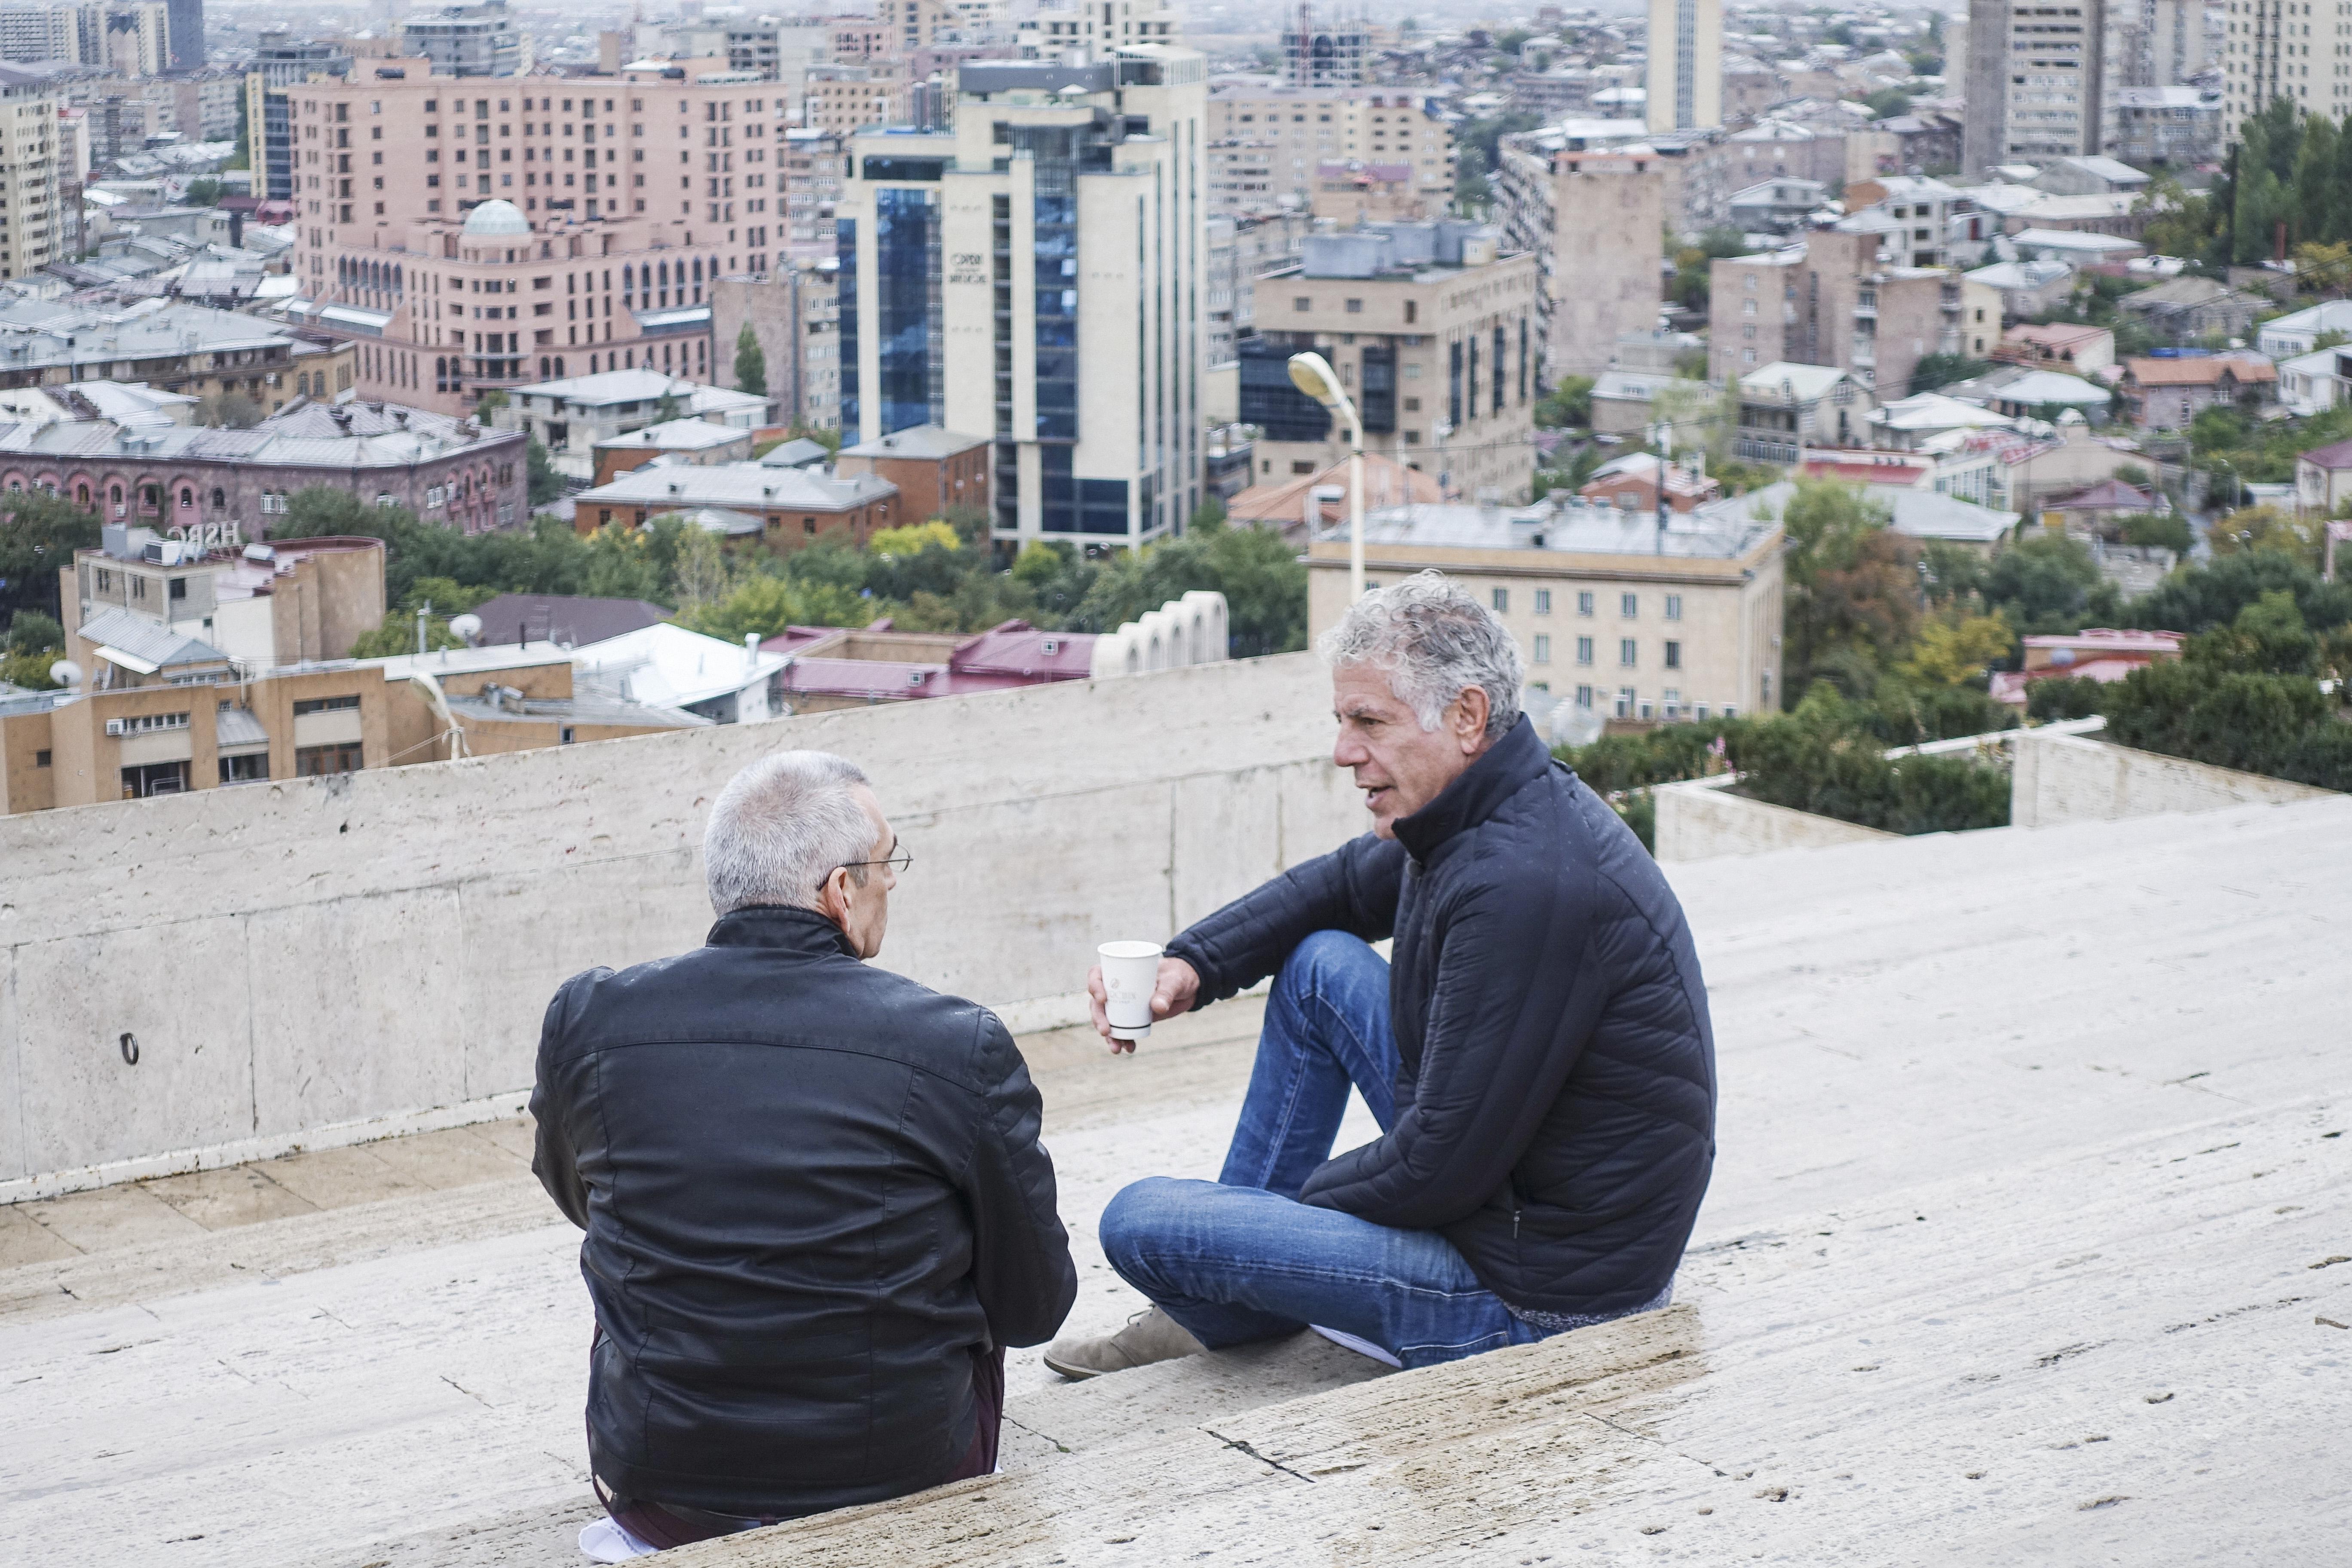 Tony and Giragosian talking in Yereven. Photo by Josh Ferrell.